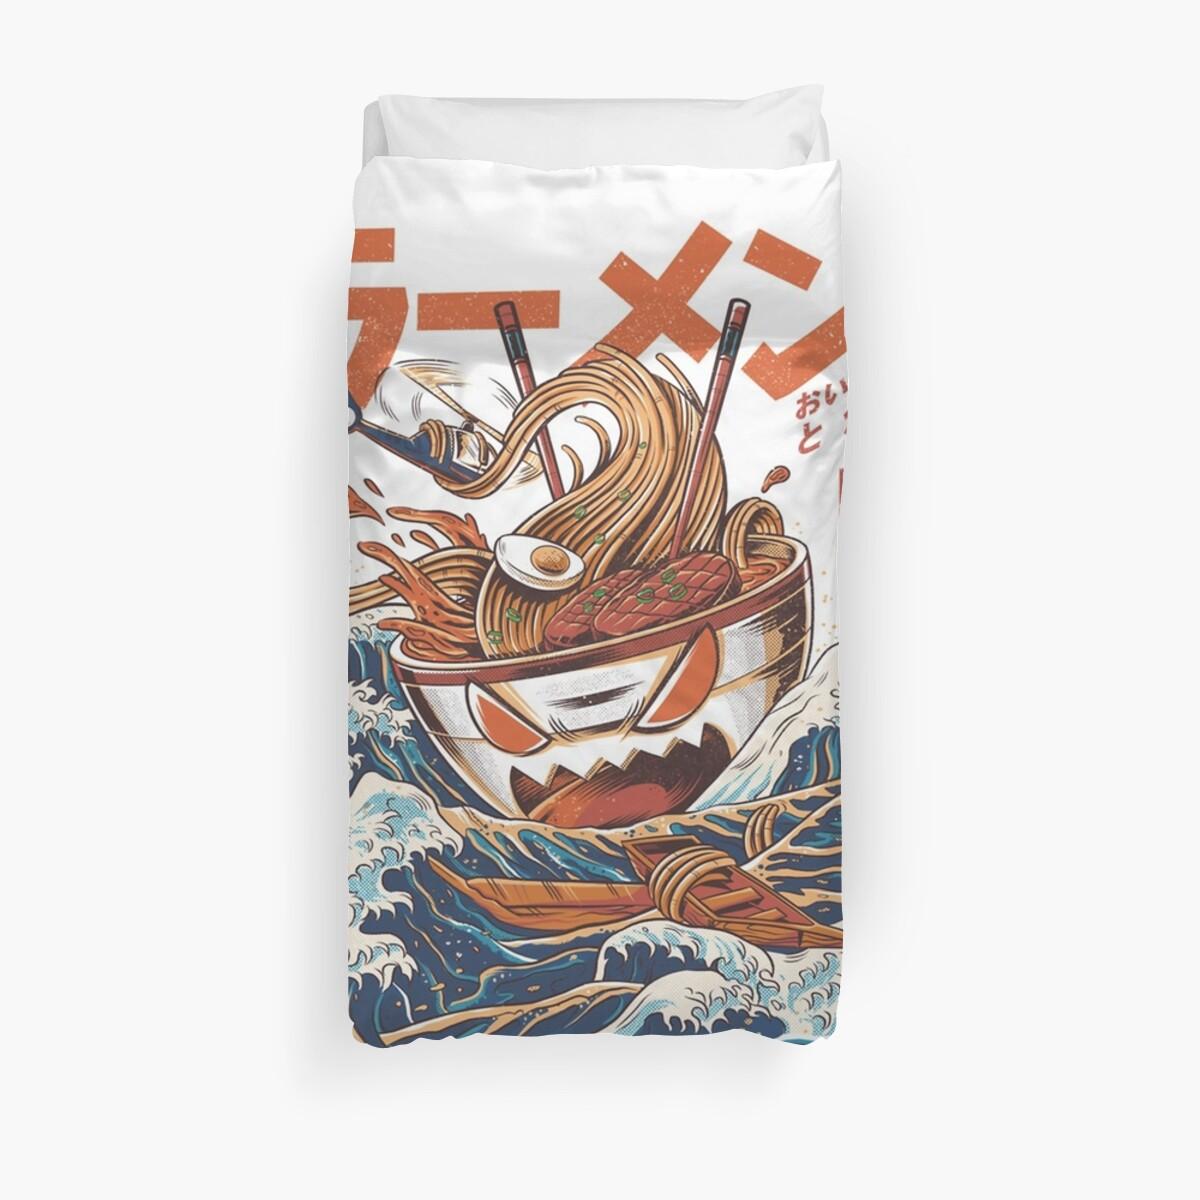 The Great Ramen off Kanagawa by Alfonso N  Bode